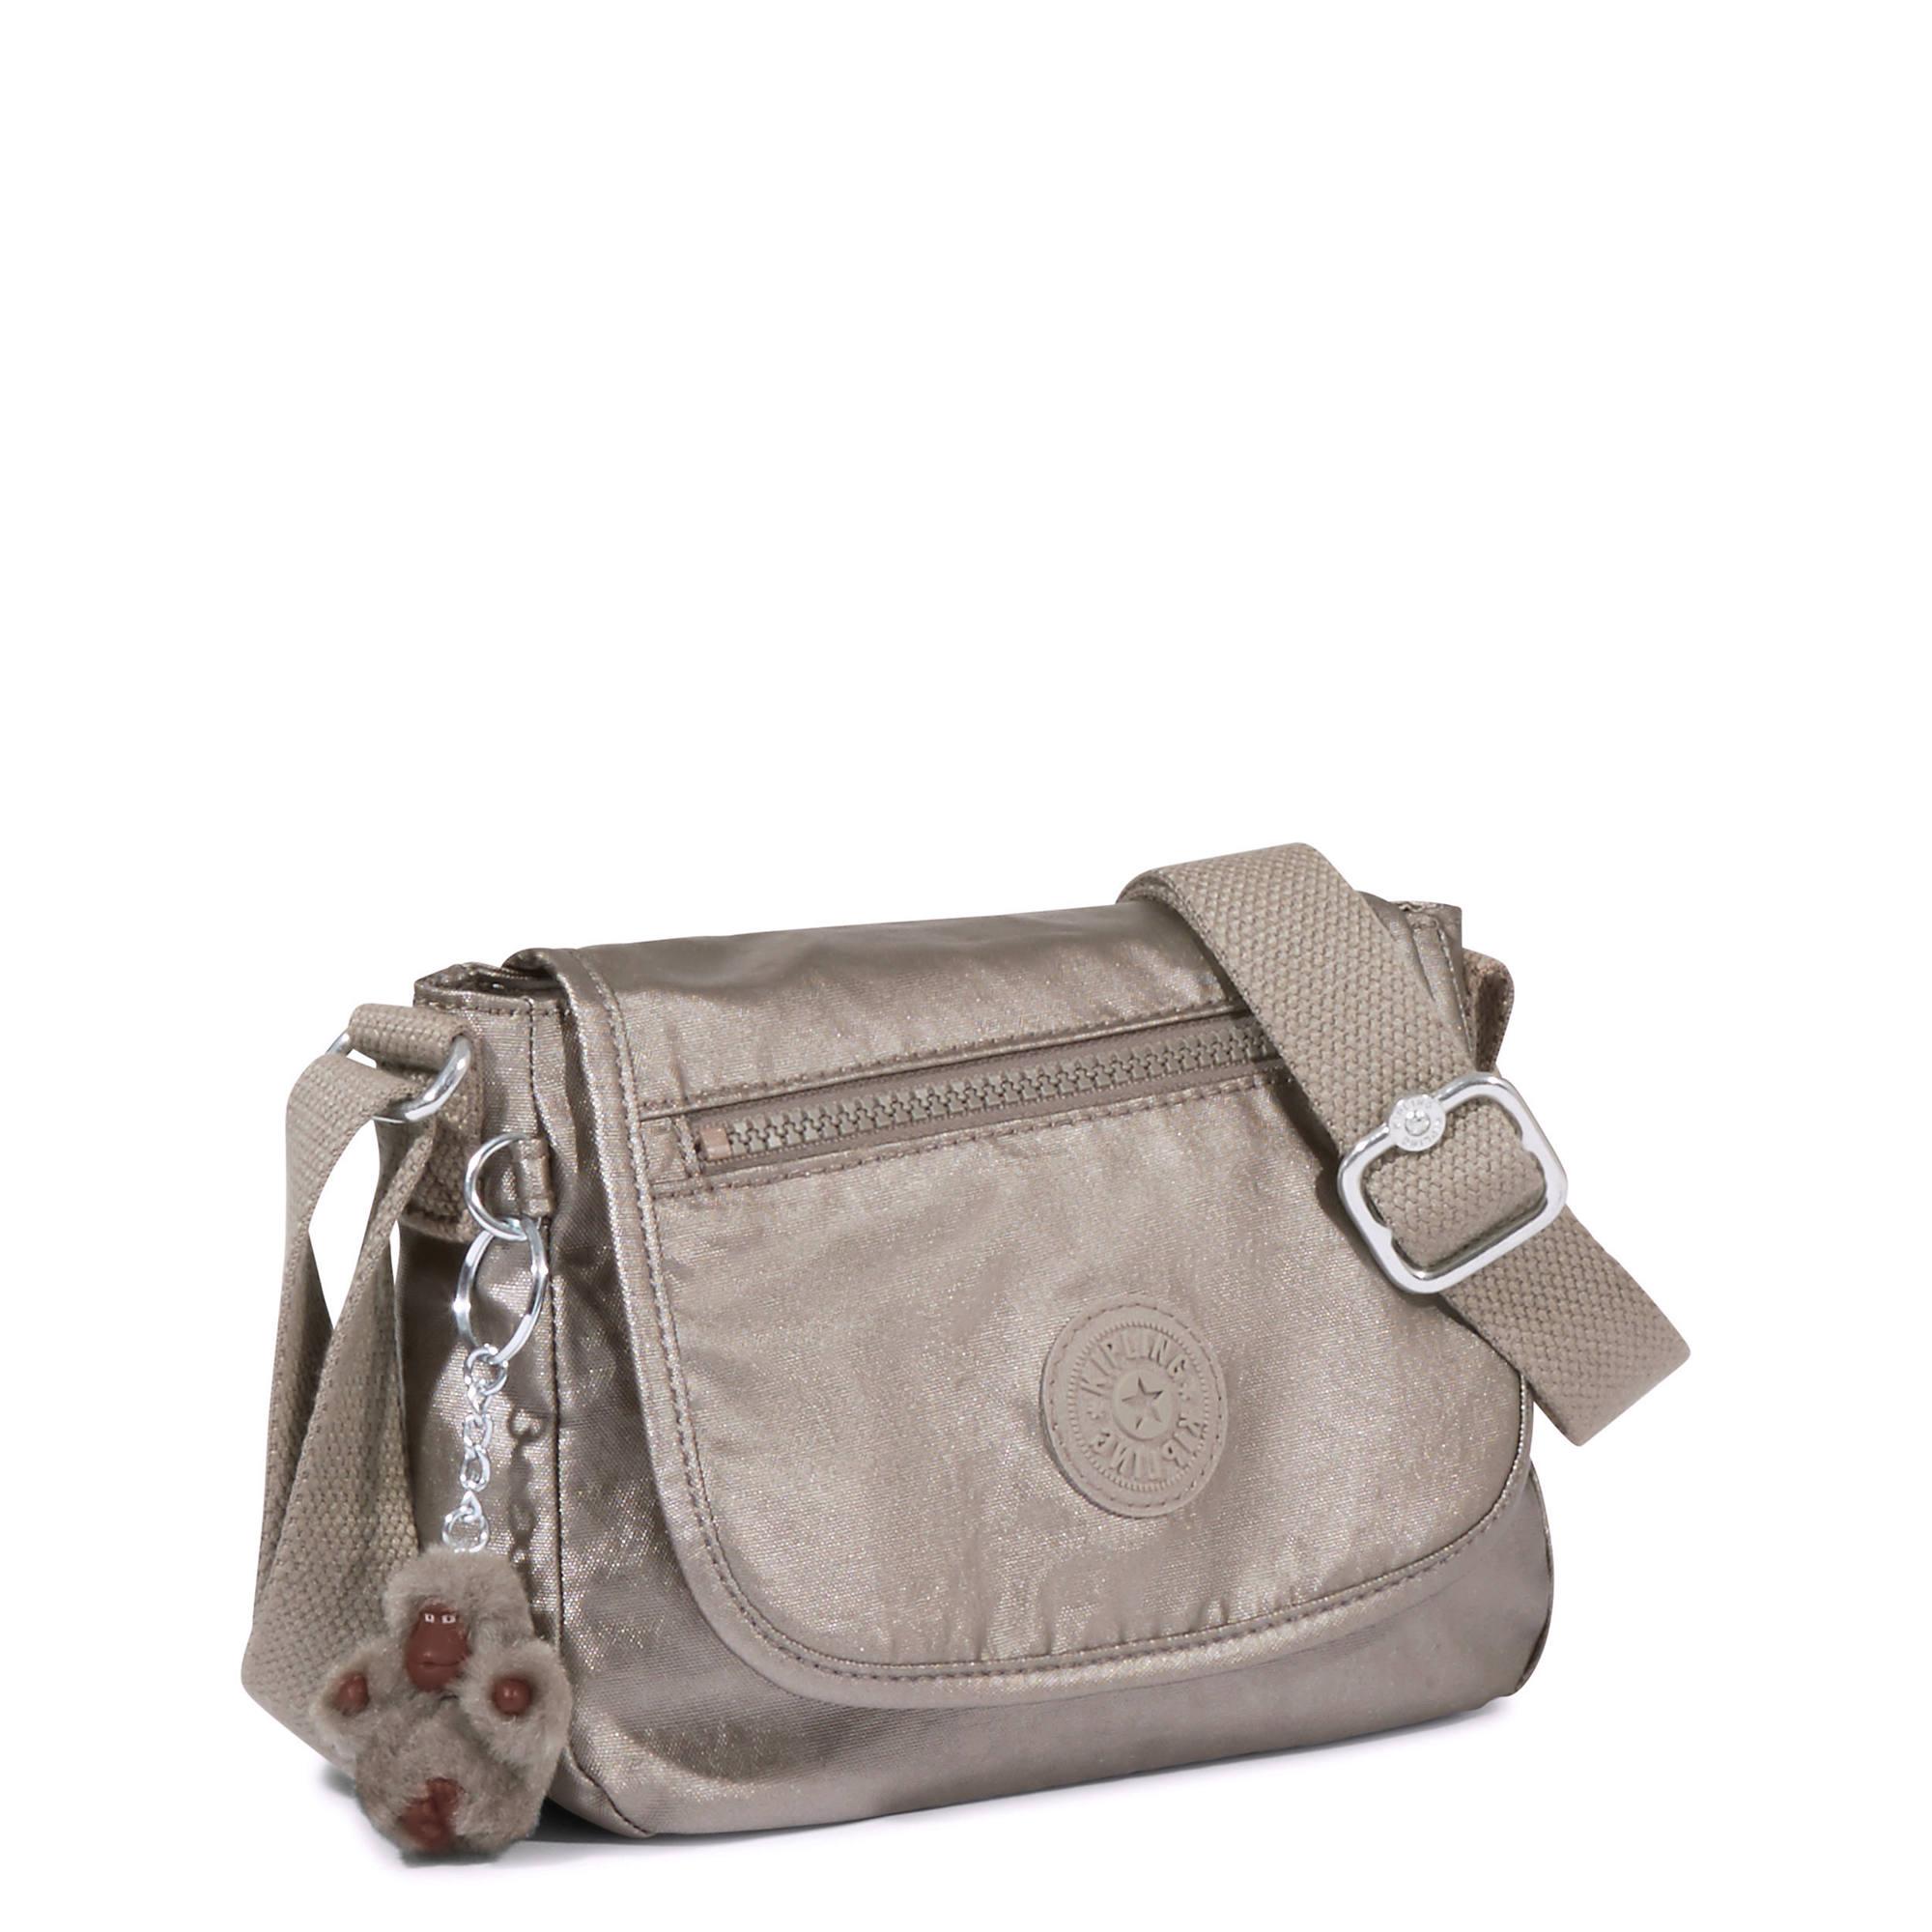 96799512ae7b Kipling Sabian U Crossbody Mini Bag Metallic Pewter for sale online ...